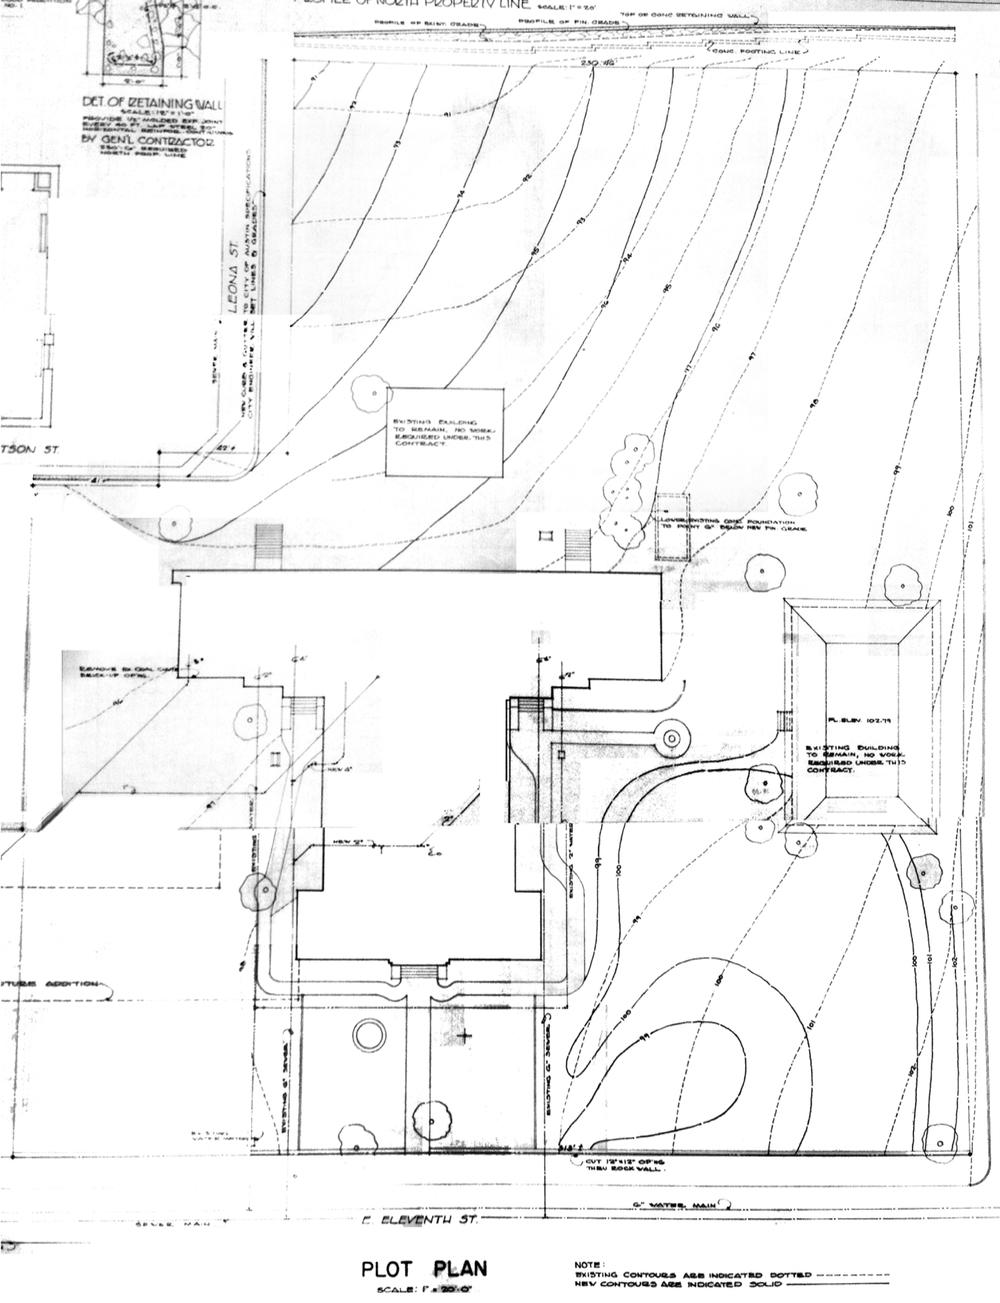 1948 Plot Plan | Jessen & Jessen Architects | Austin History Center